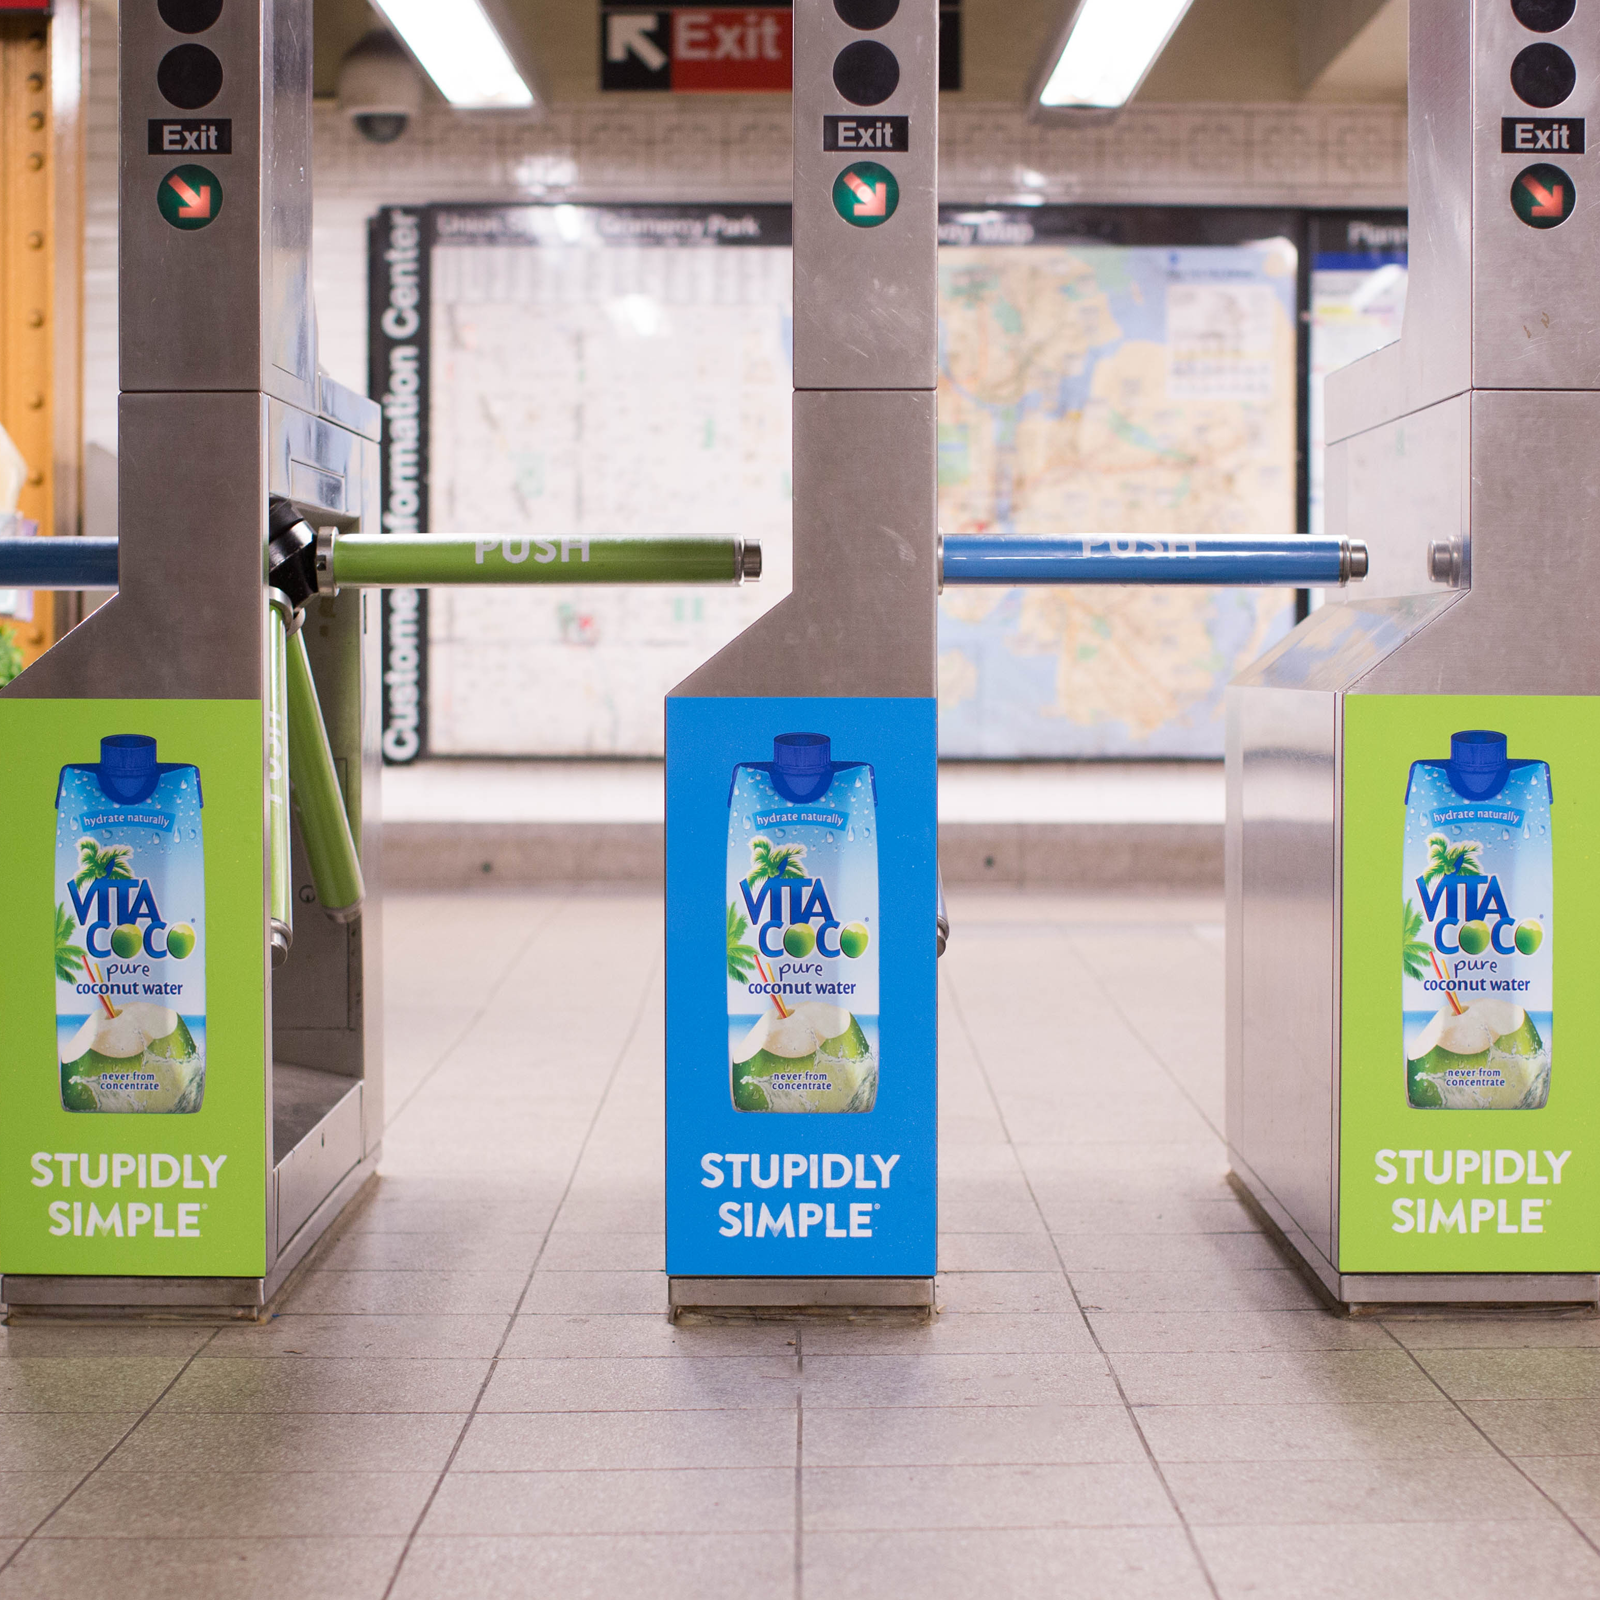 VC_subway_entry.png